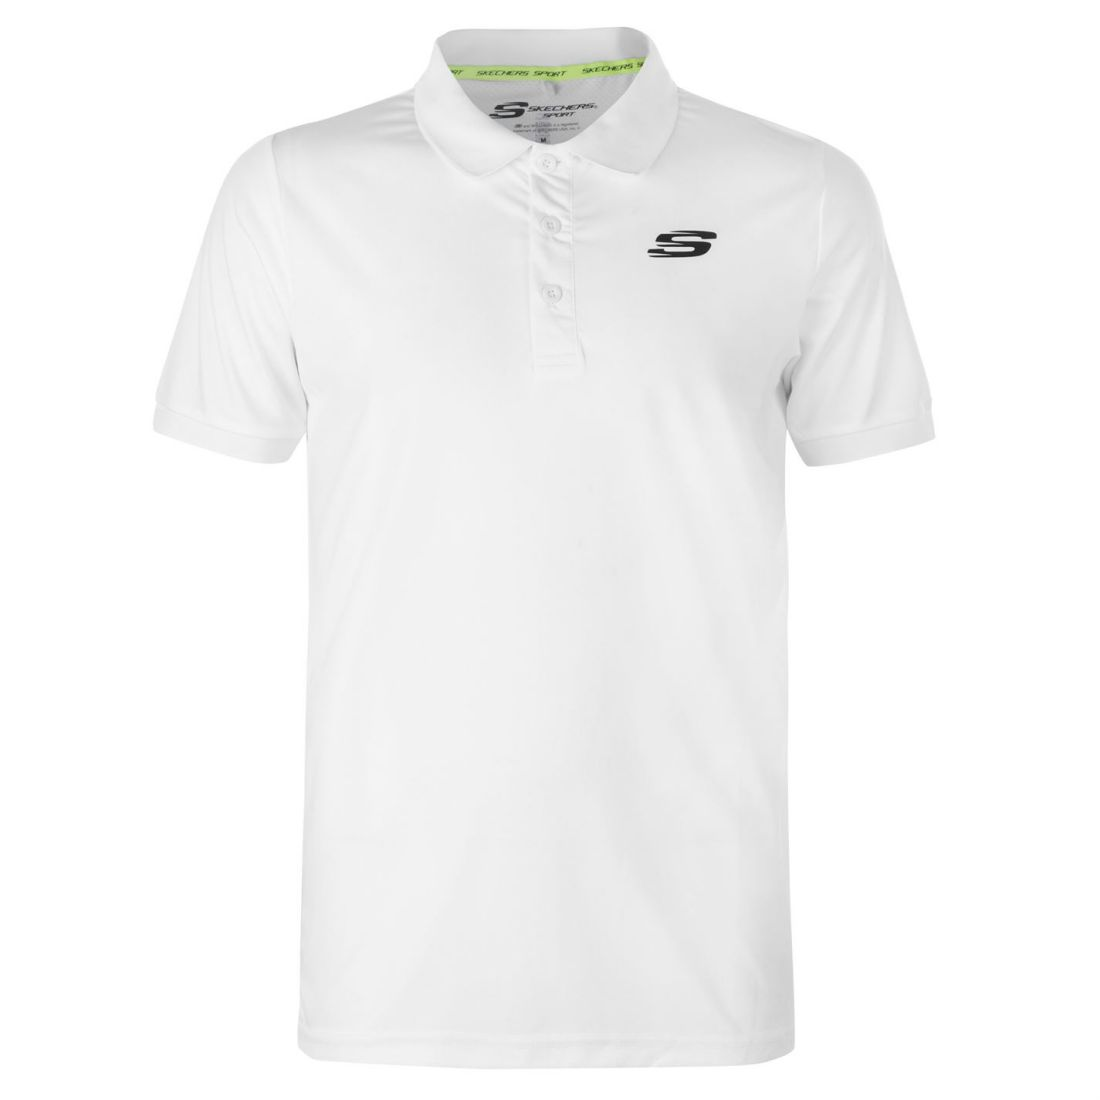 Skechers Mens Mesh Back Polo Shirt